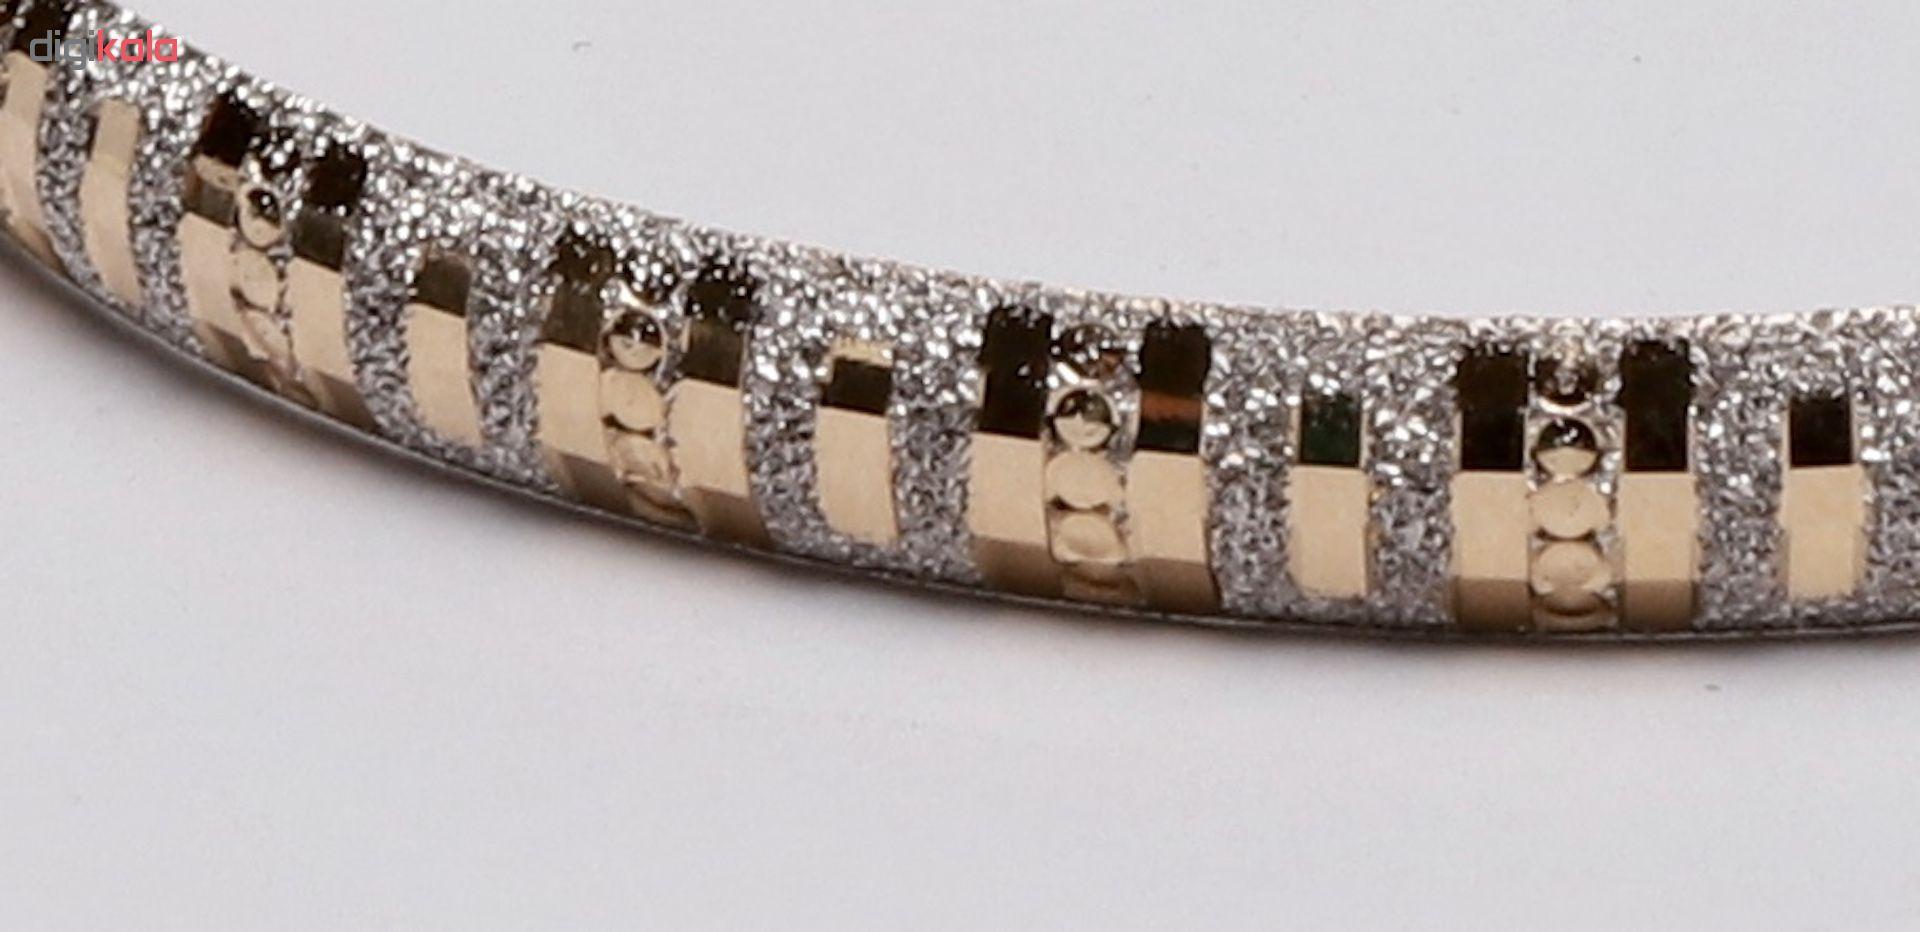 النگو طلا 18 عیار گوی گالری مدل G242